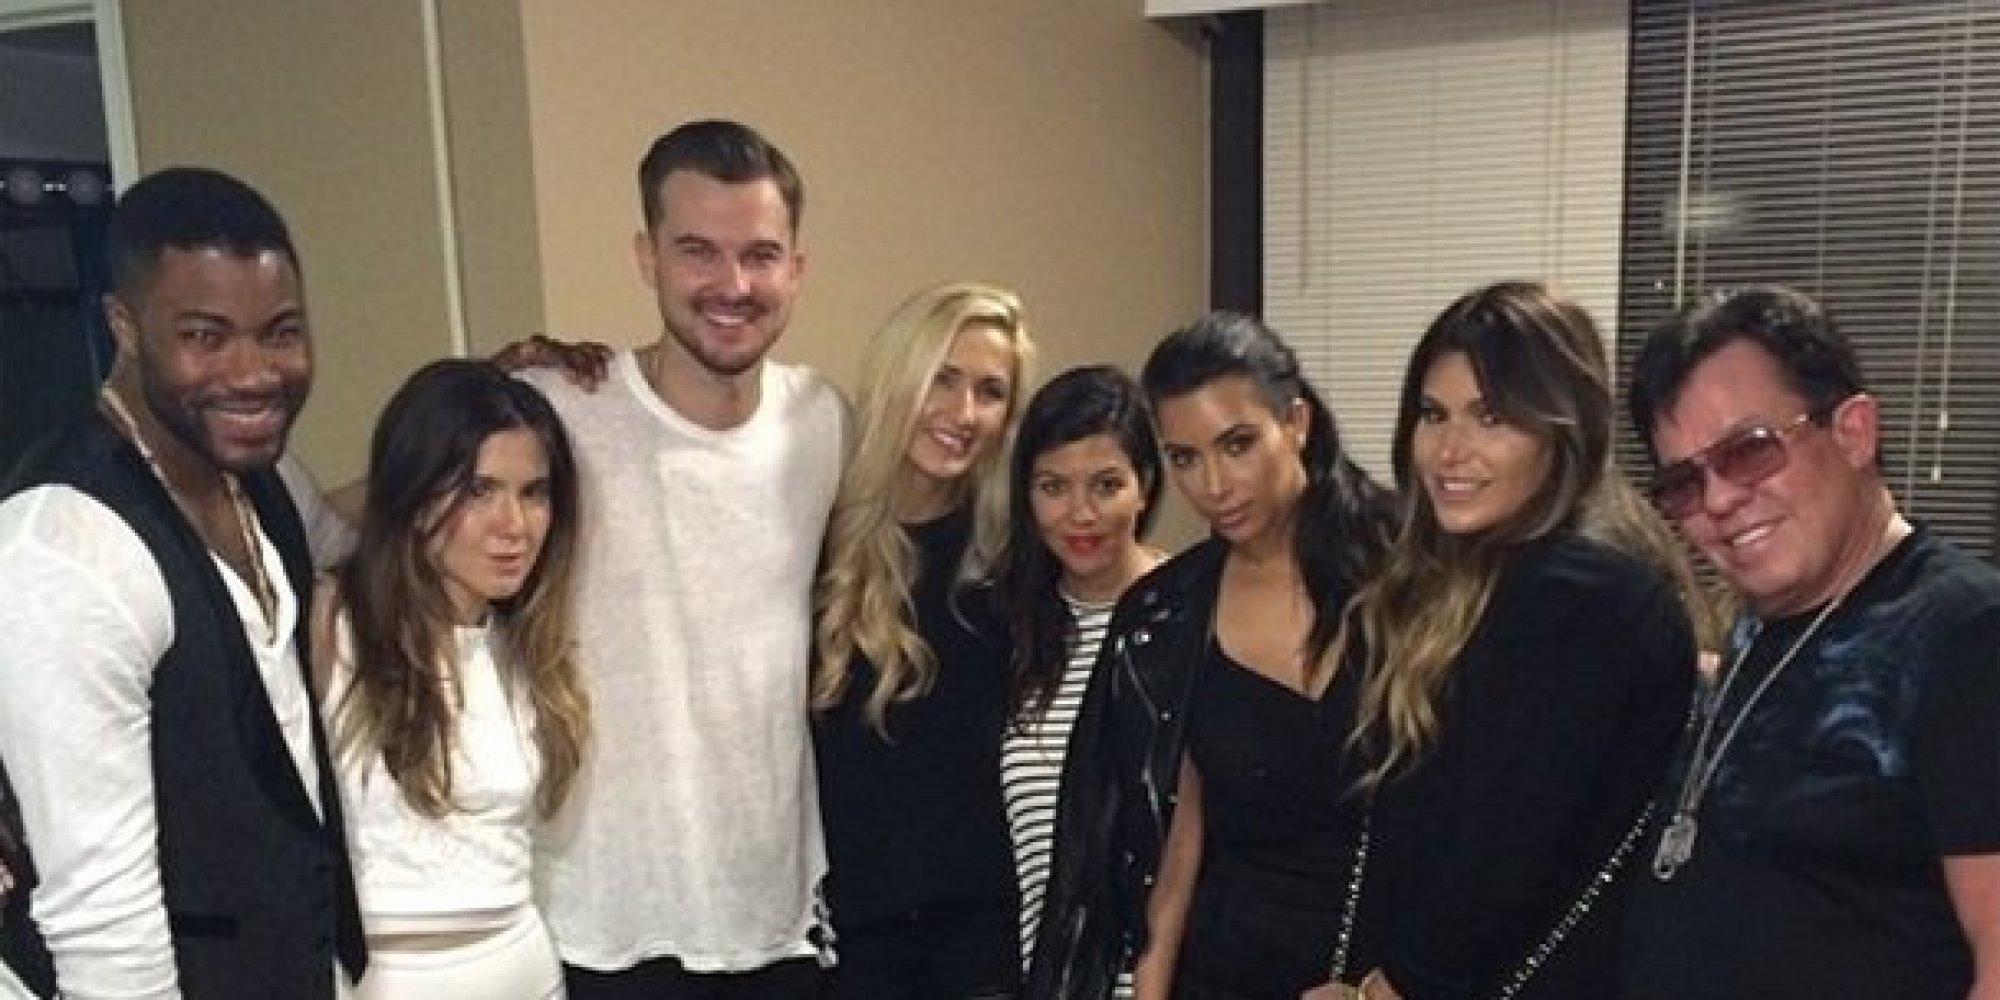 Kim Kardashian On Church The Family That Prays Together Stays